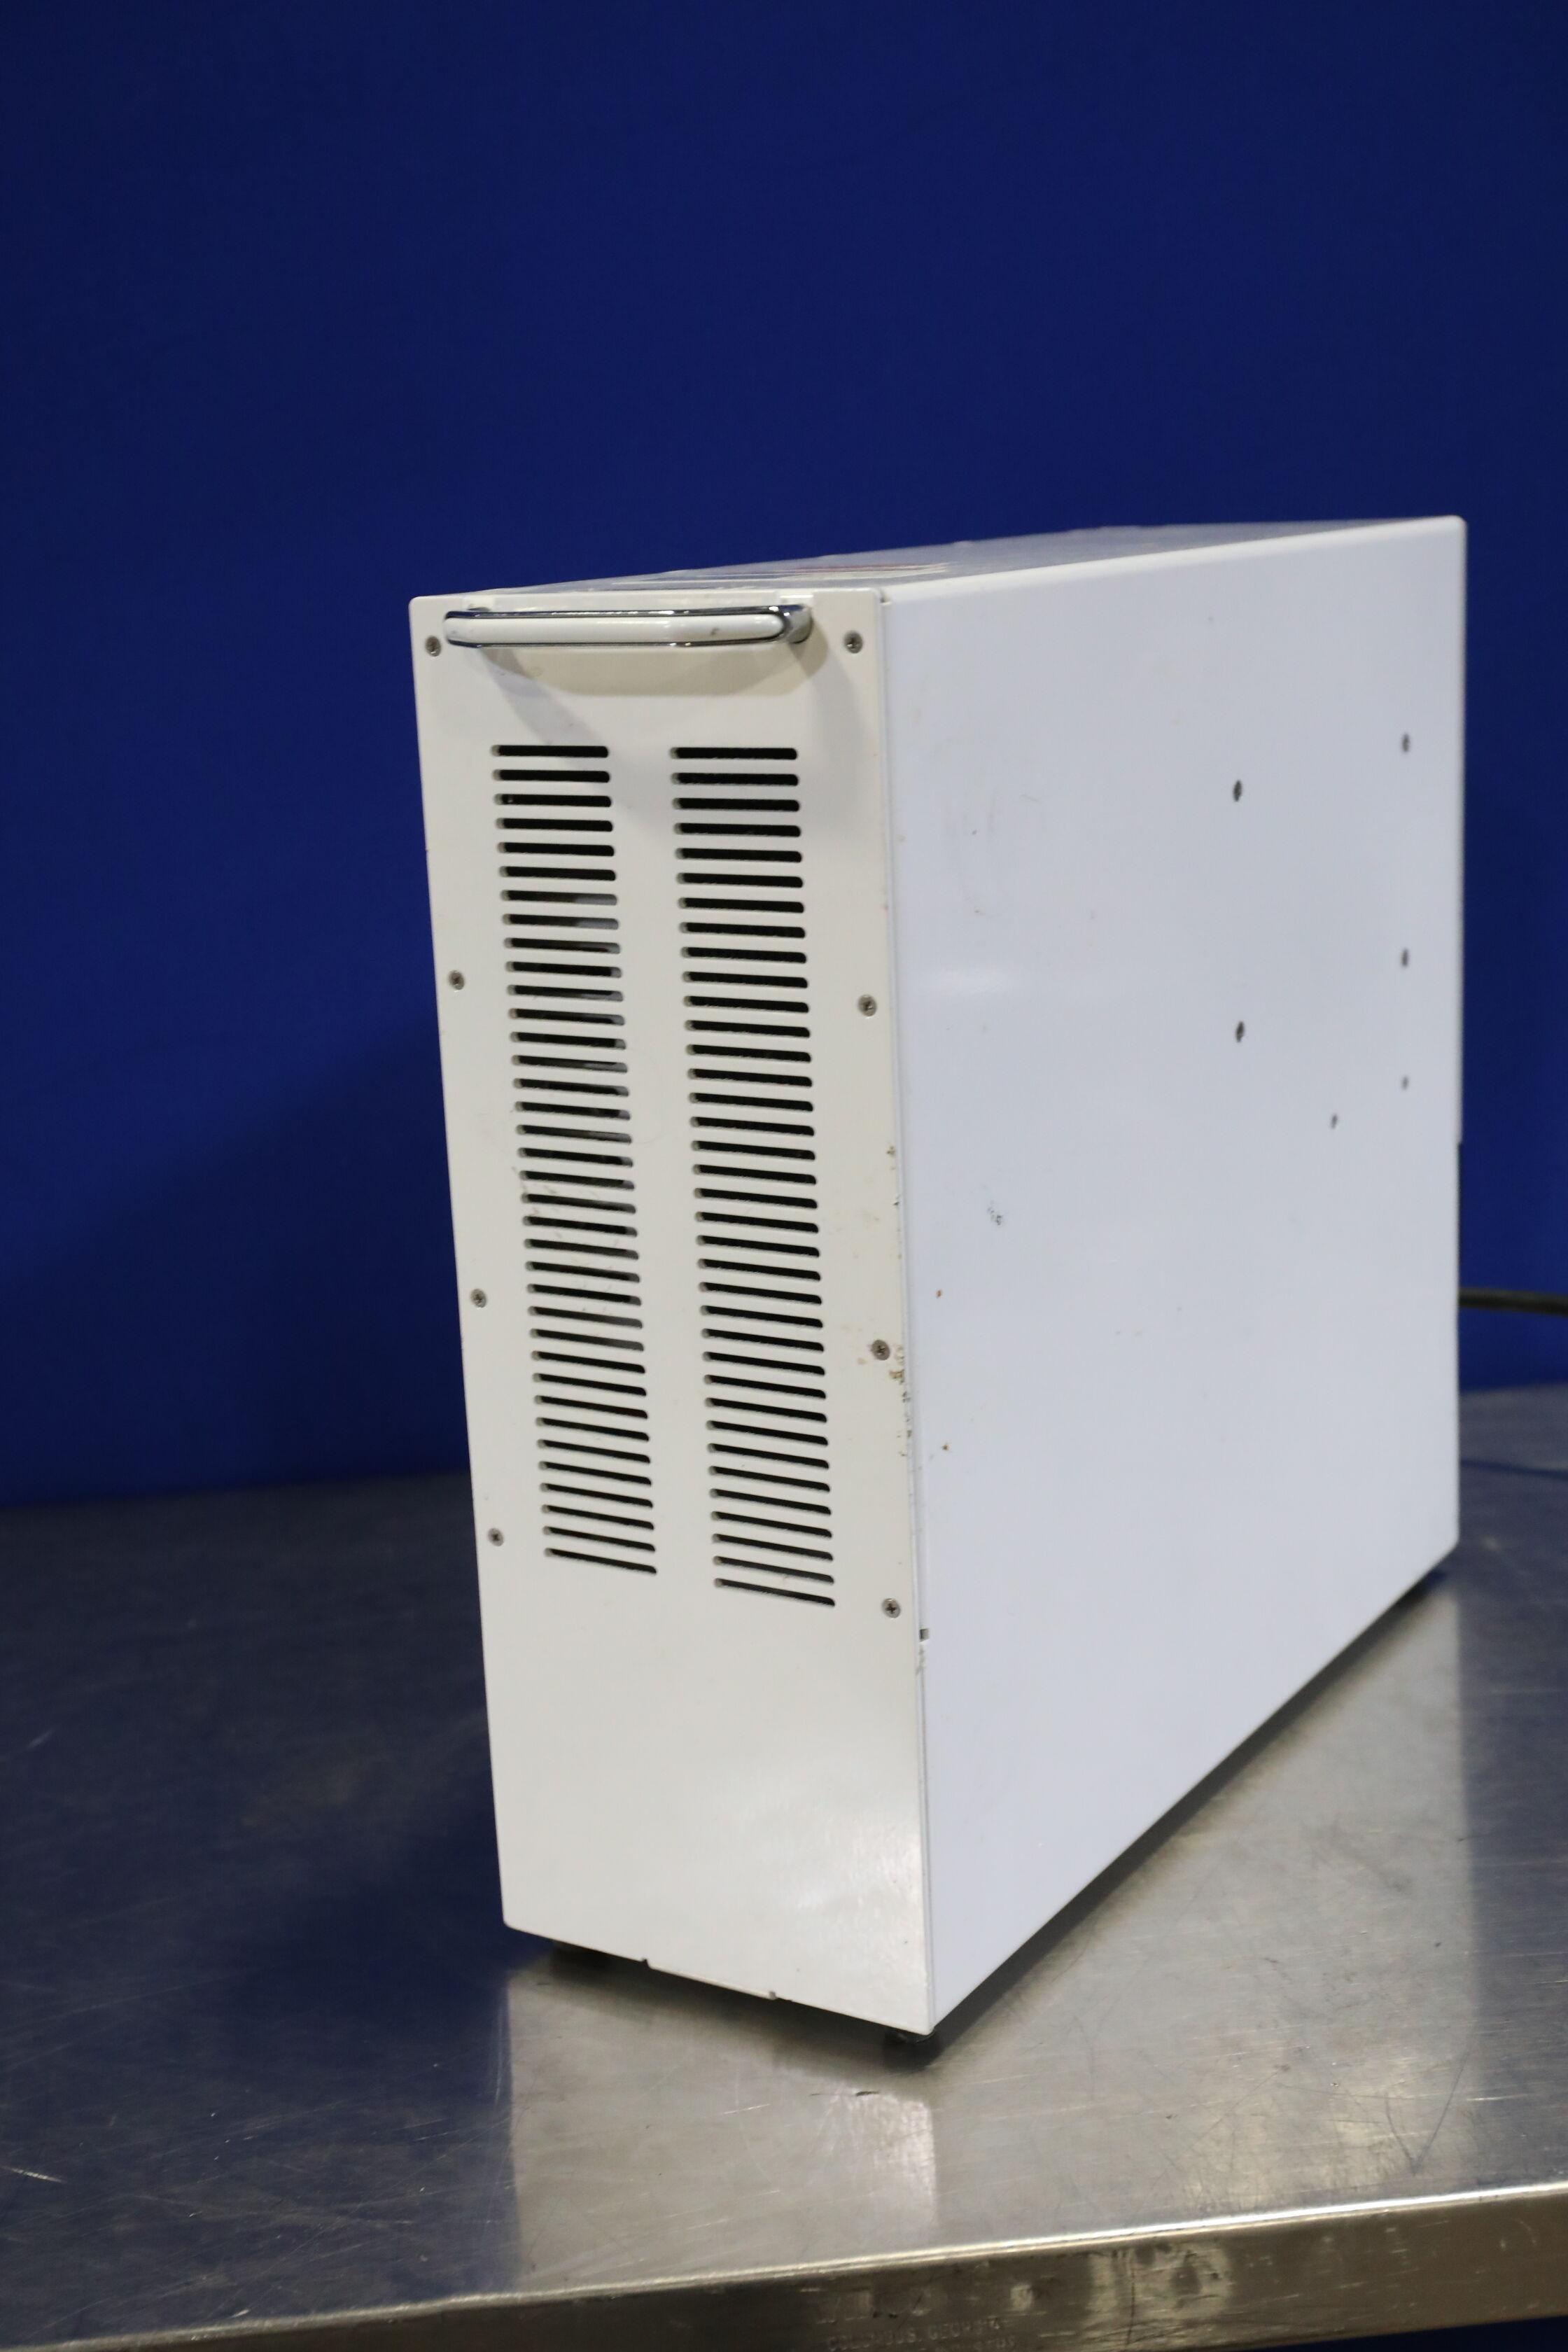 ABSOLUTE ELECTRONICS RHA2020 Uninterruptible Power Supply / UPS